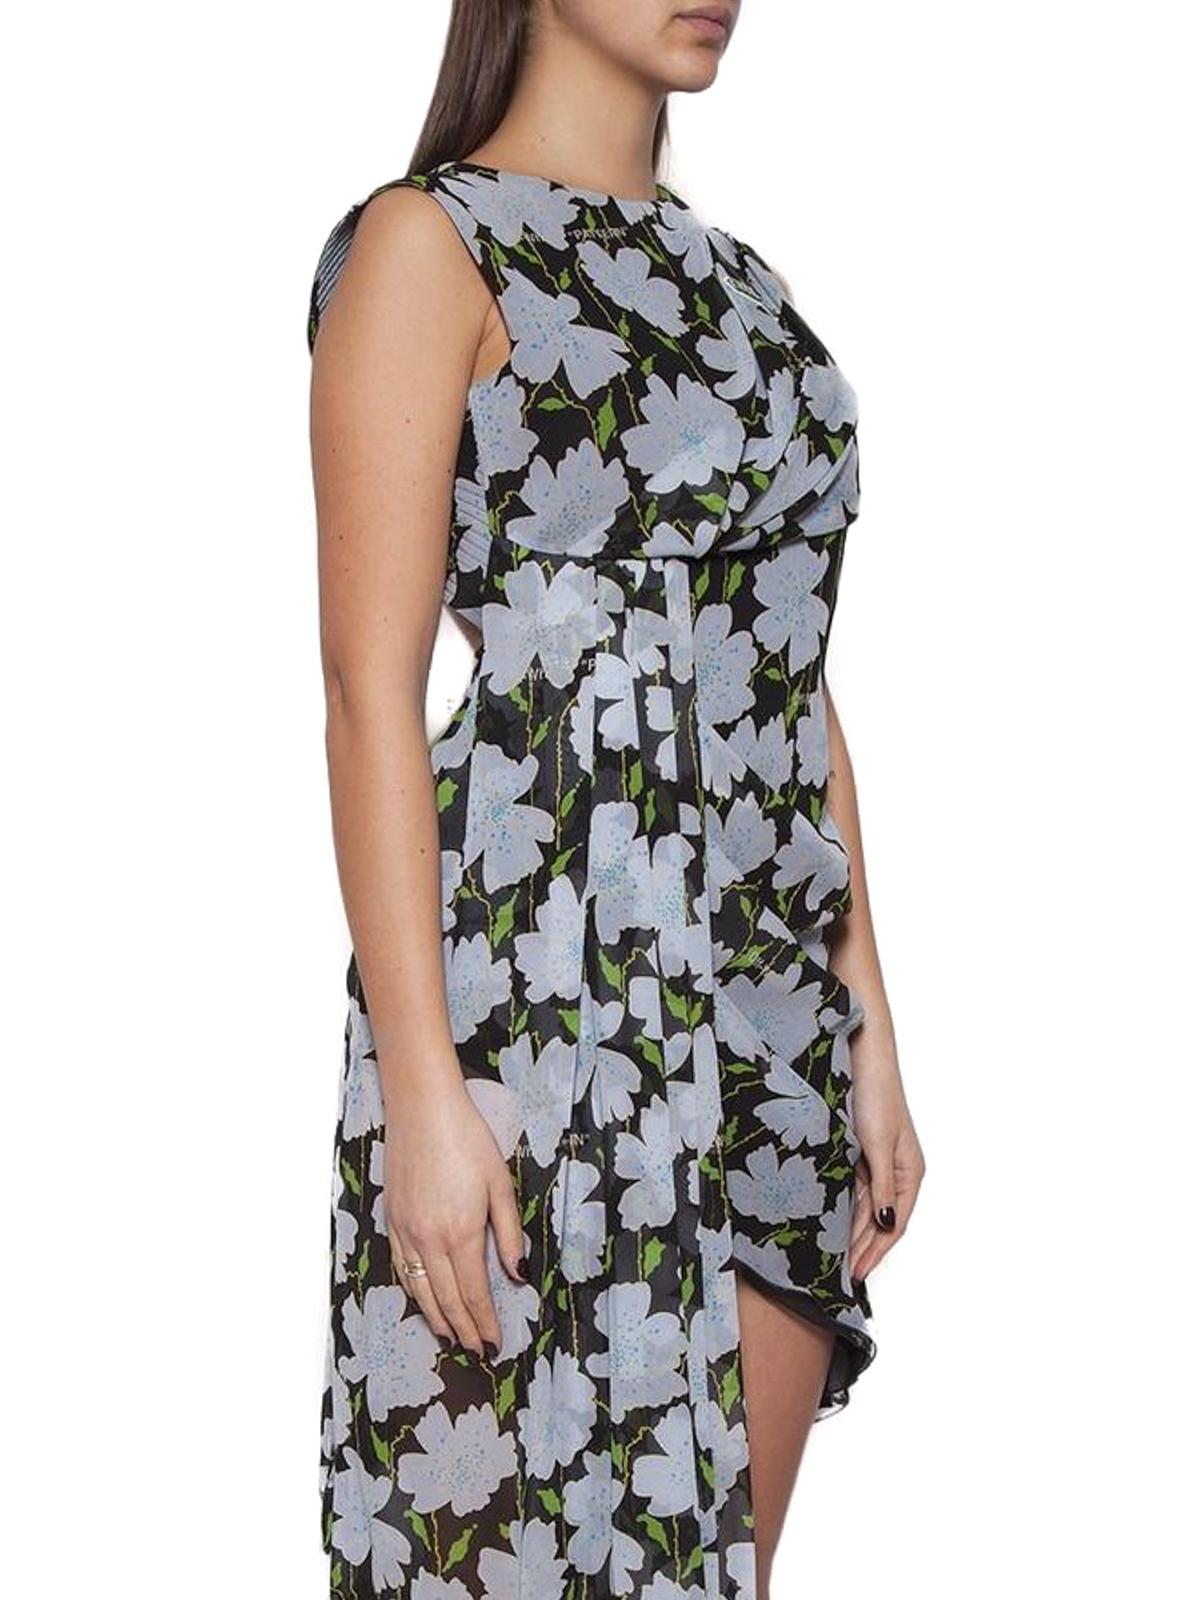 49901de539e7 Off-White - Floral print silk asymmetric dress - cocktail dresses ...